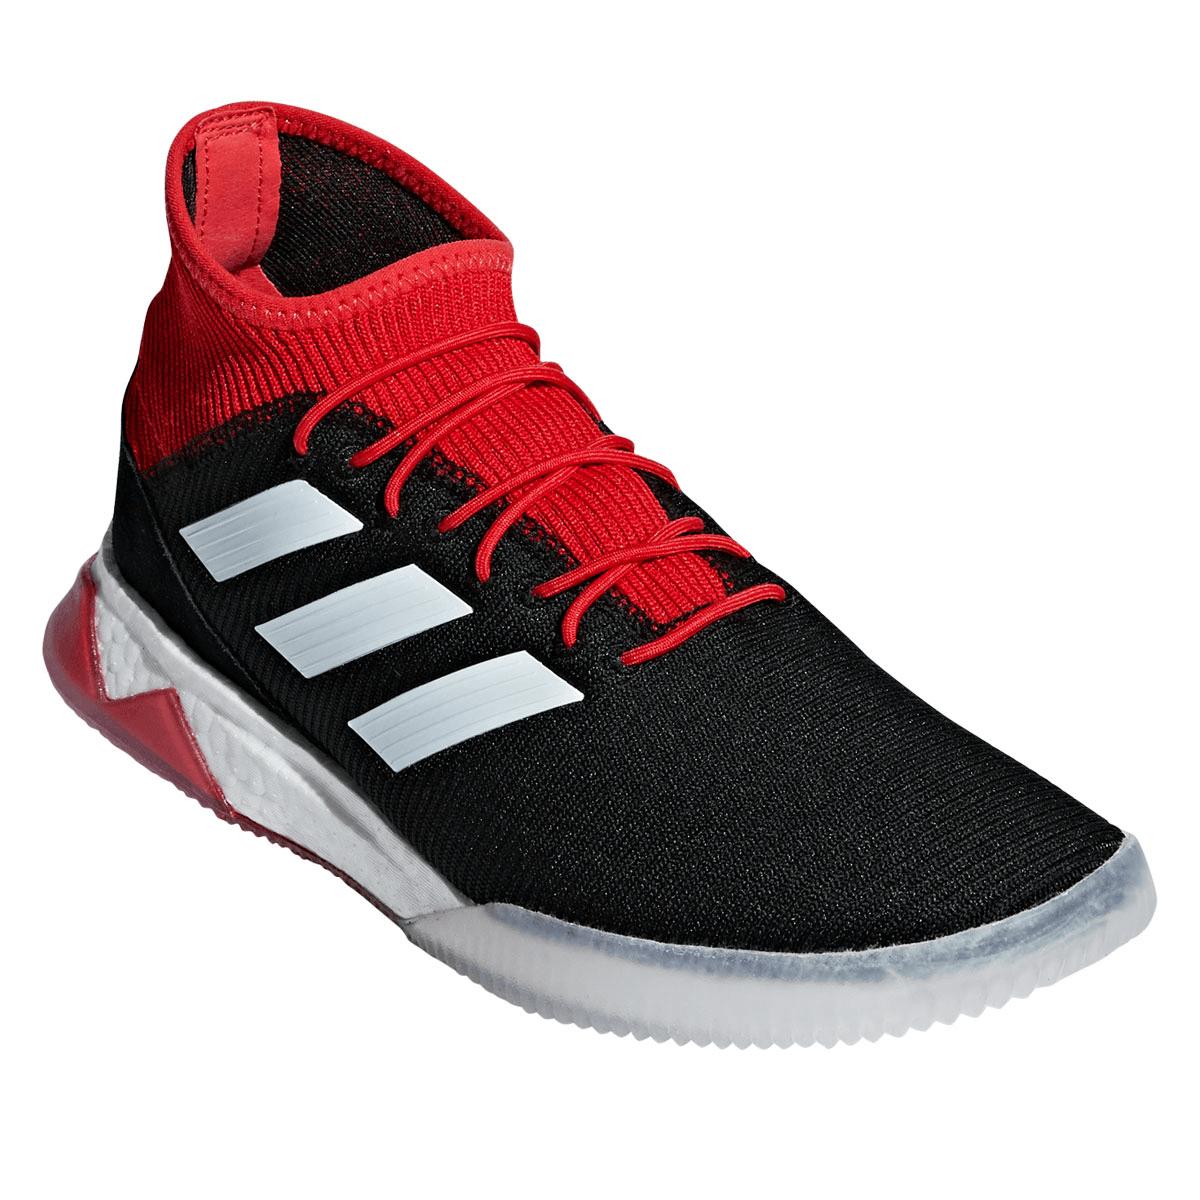 Adidas Predator Tango 18.1 TR Wit Grijs Zonne Rood